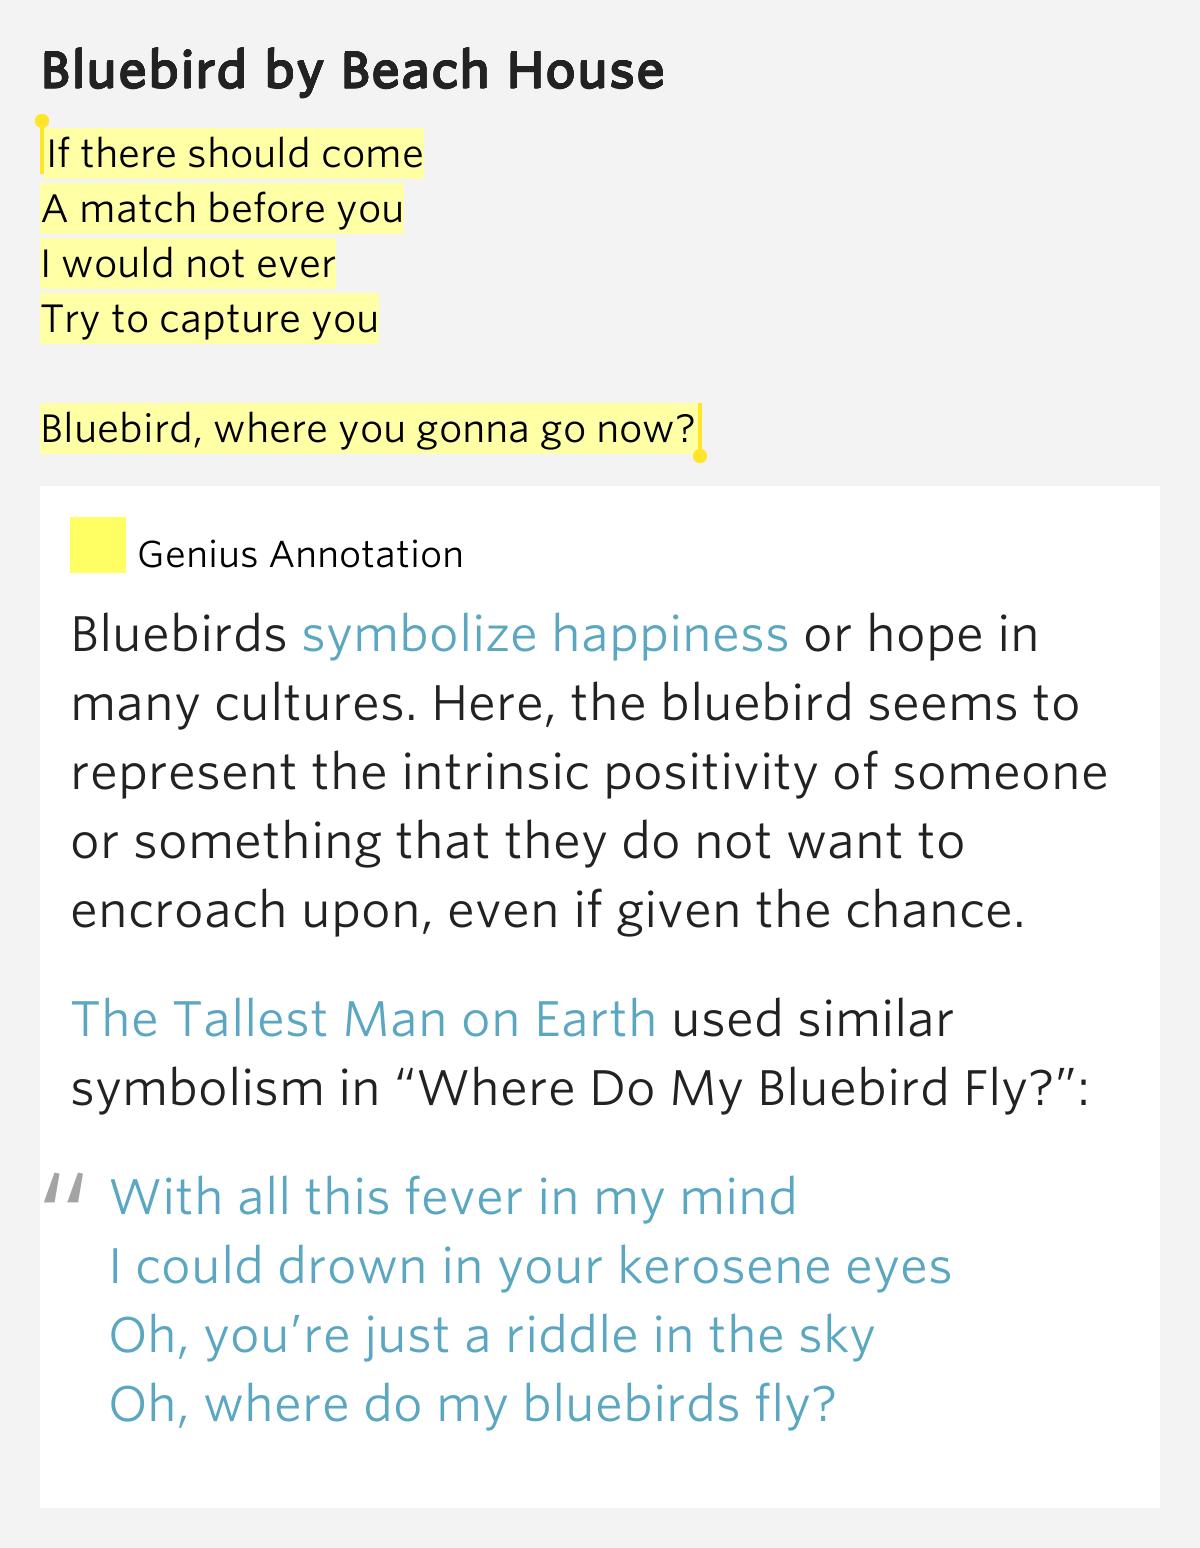 Nirvana - Lithium - Lyrics analysis and meaning   Scenario ...